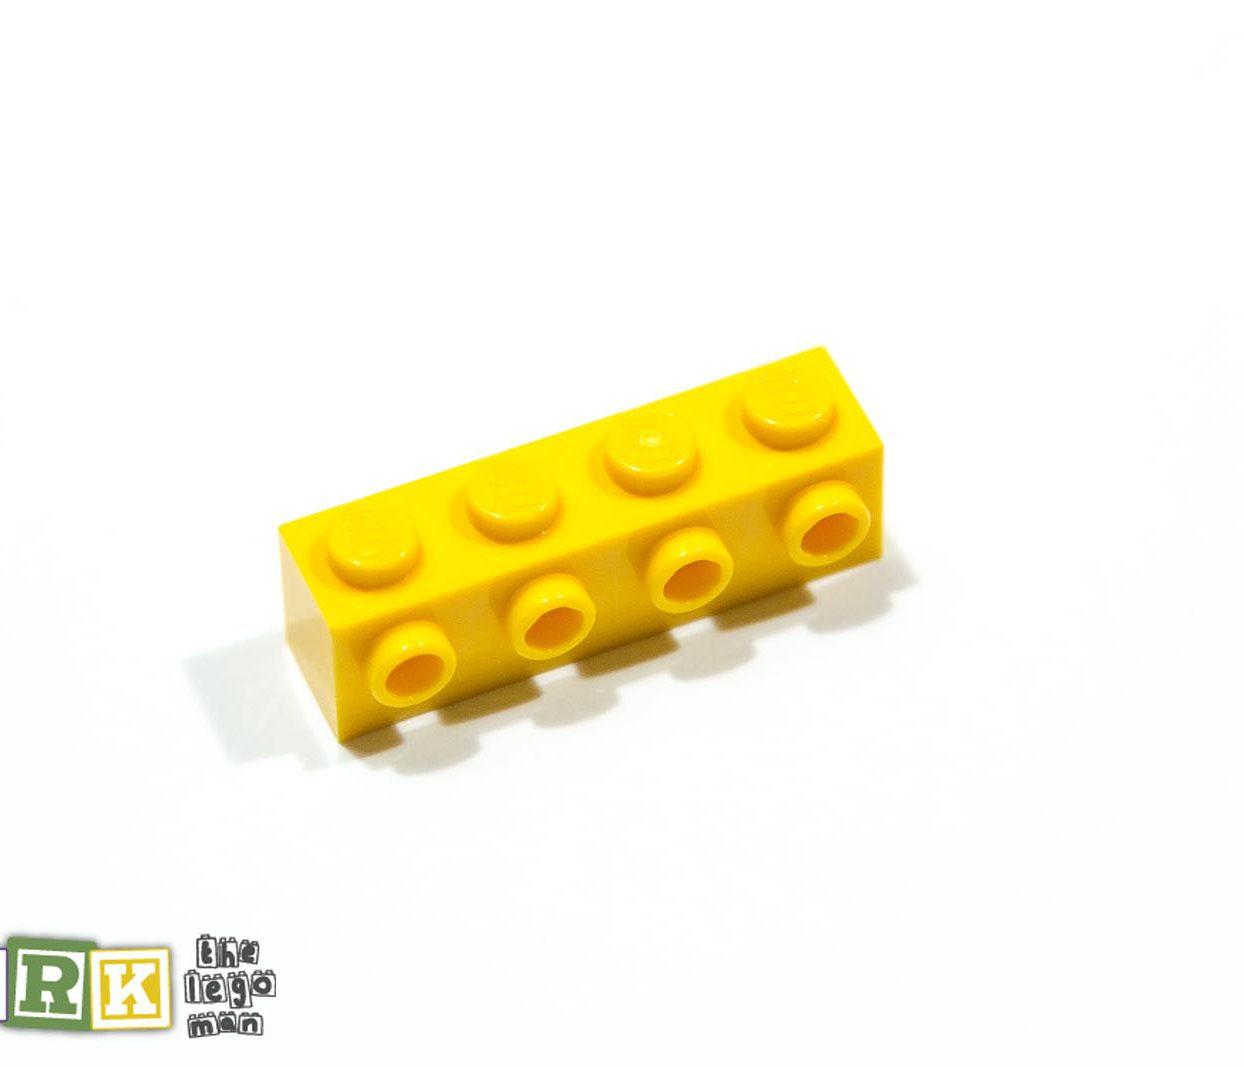 NEW Lego 4164073 30414 1x Bright Yellow 1x4 Brick with 4 Knobs